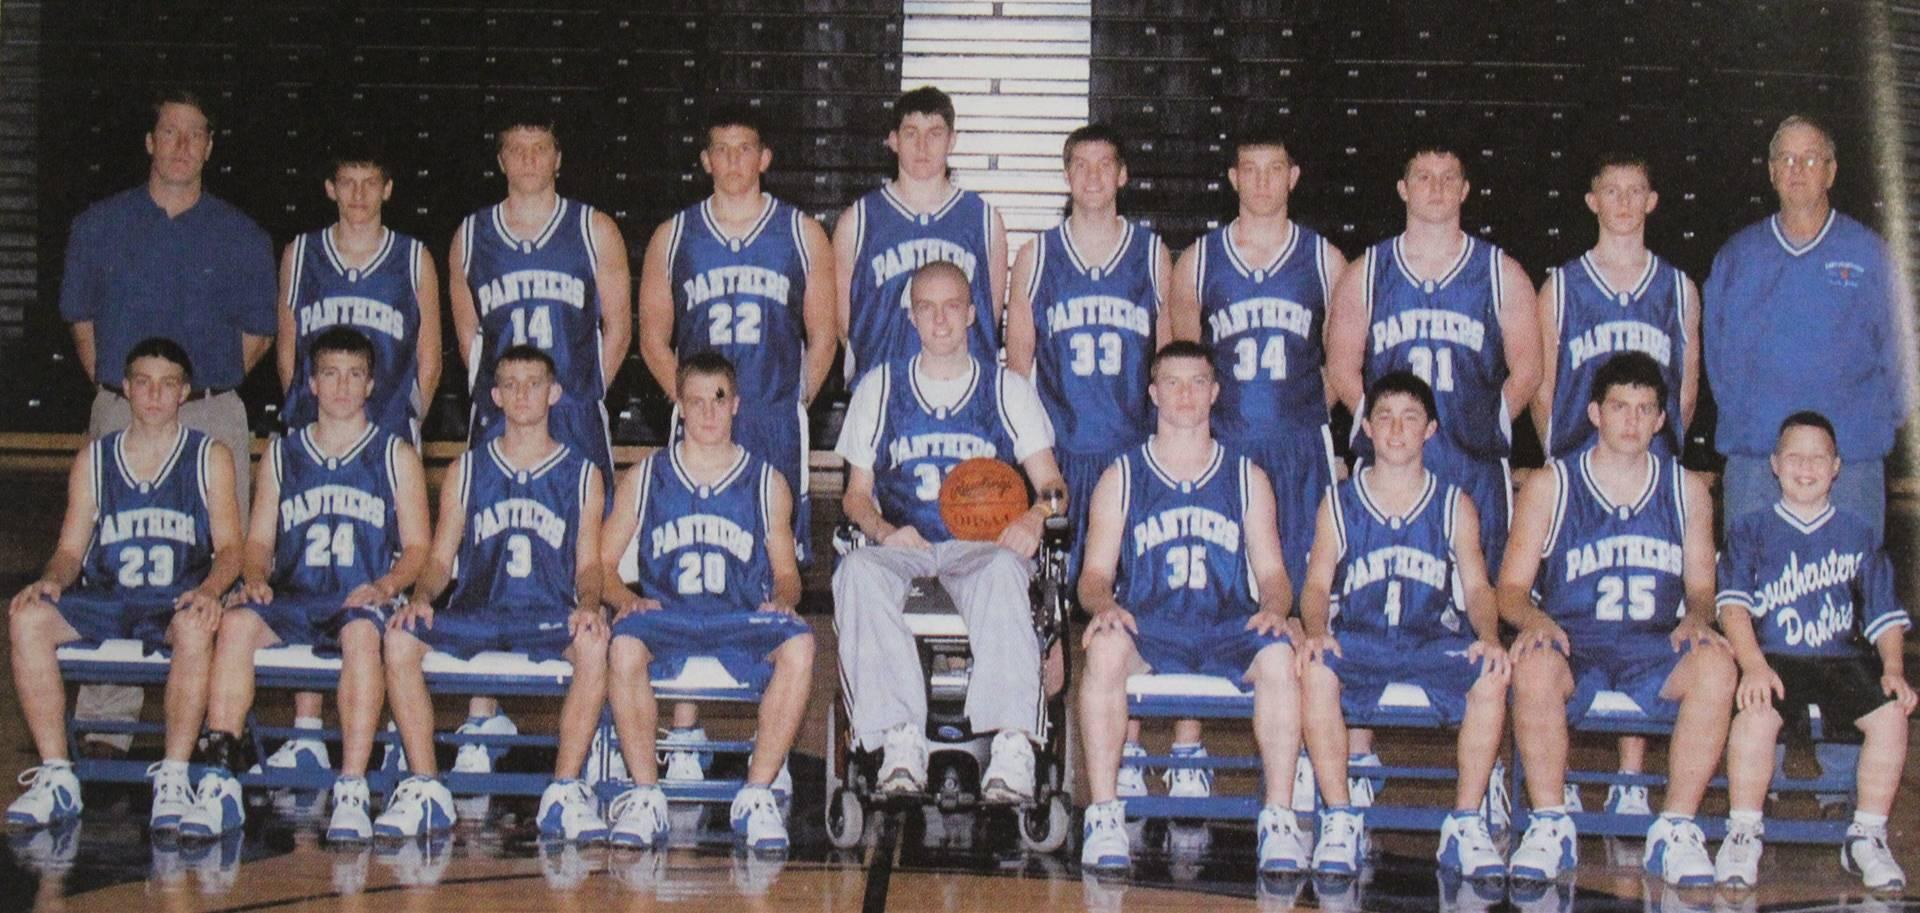 2005 Boys Basketball